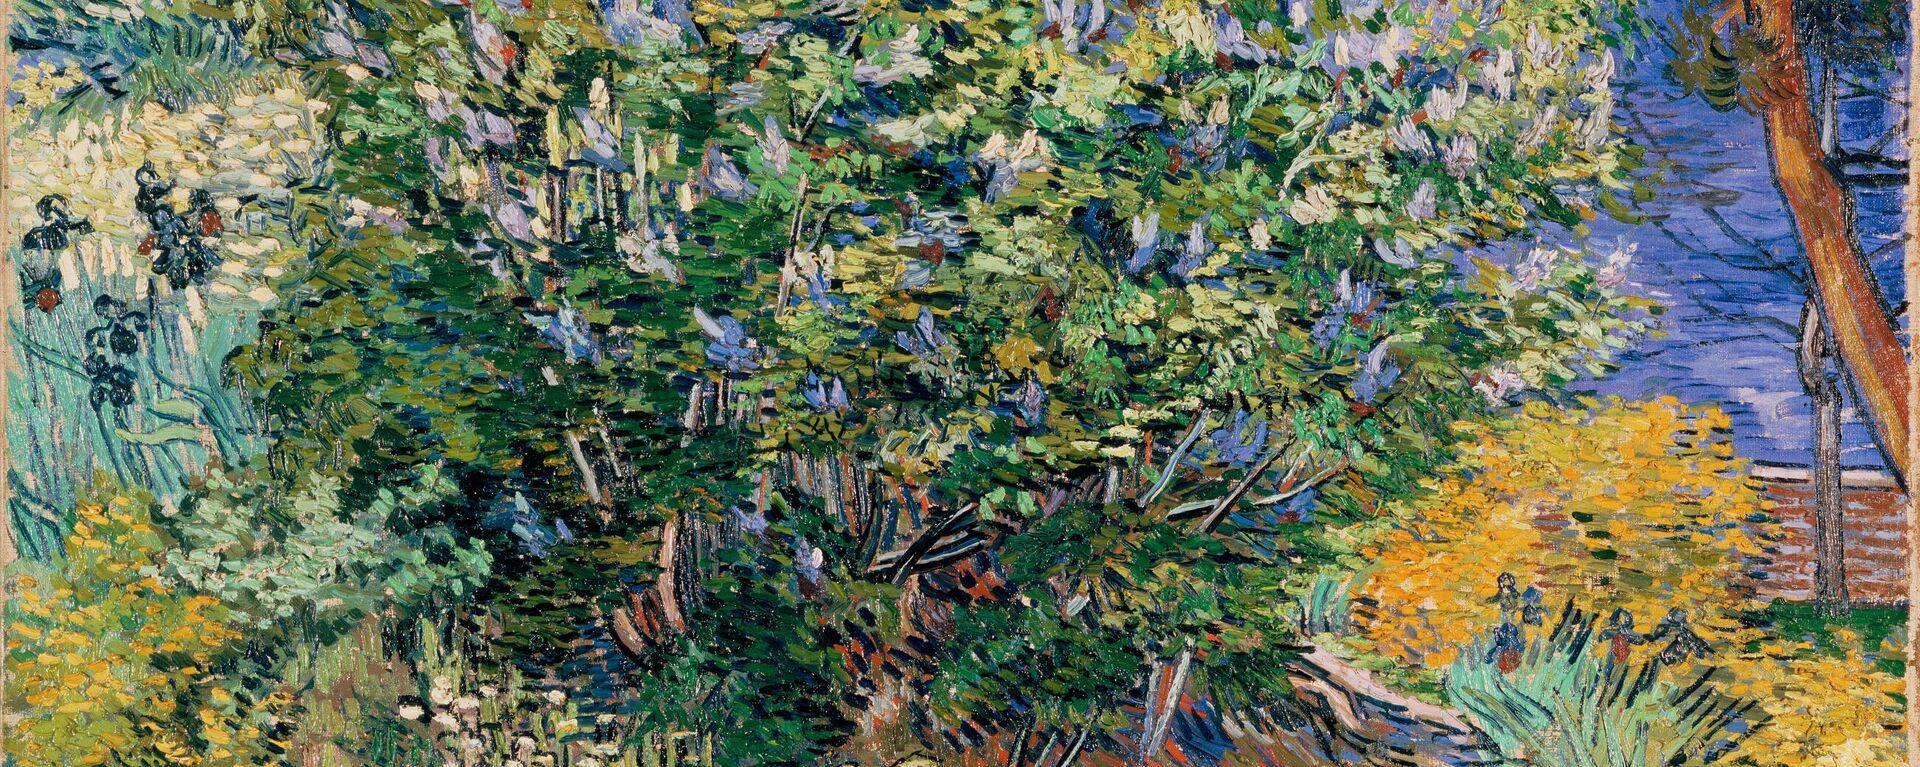 'Las lilas' de Vincent Van Gogh - Sputnik Mundo, 1920, 31.08.2021